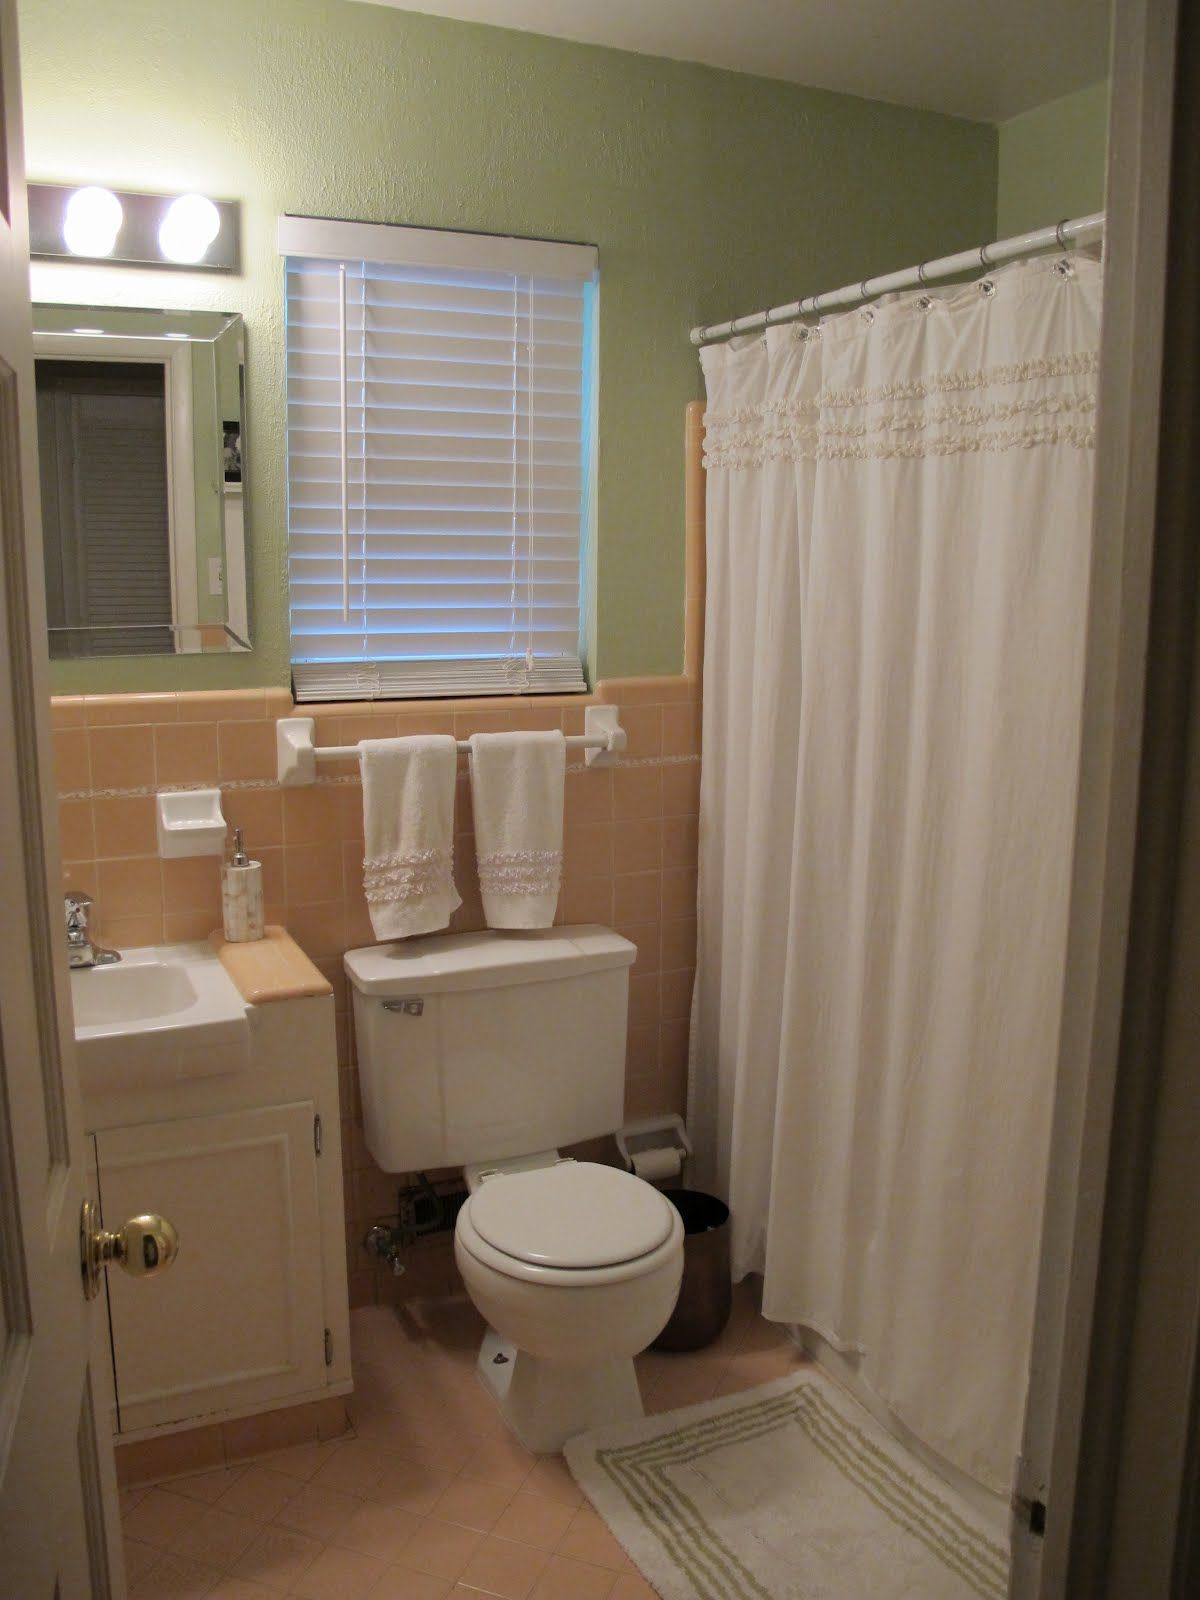 Help, Peach/Brown Bathroom Tile - Home Decorating & Design ...